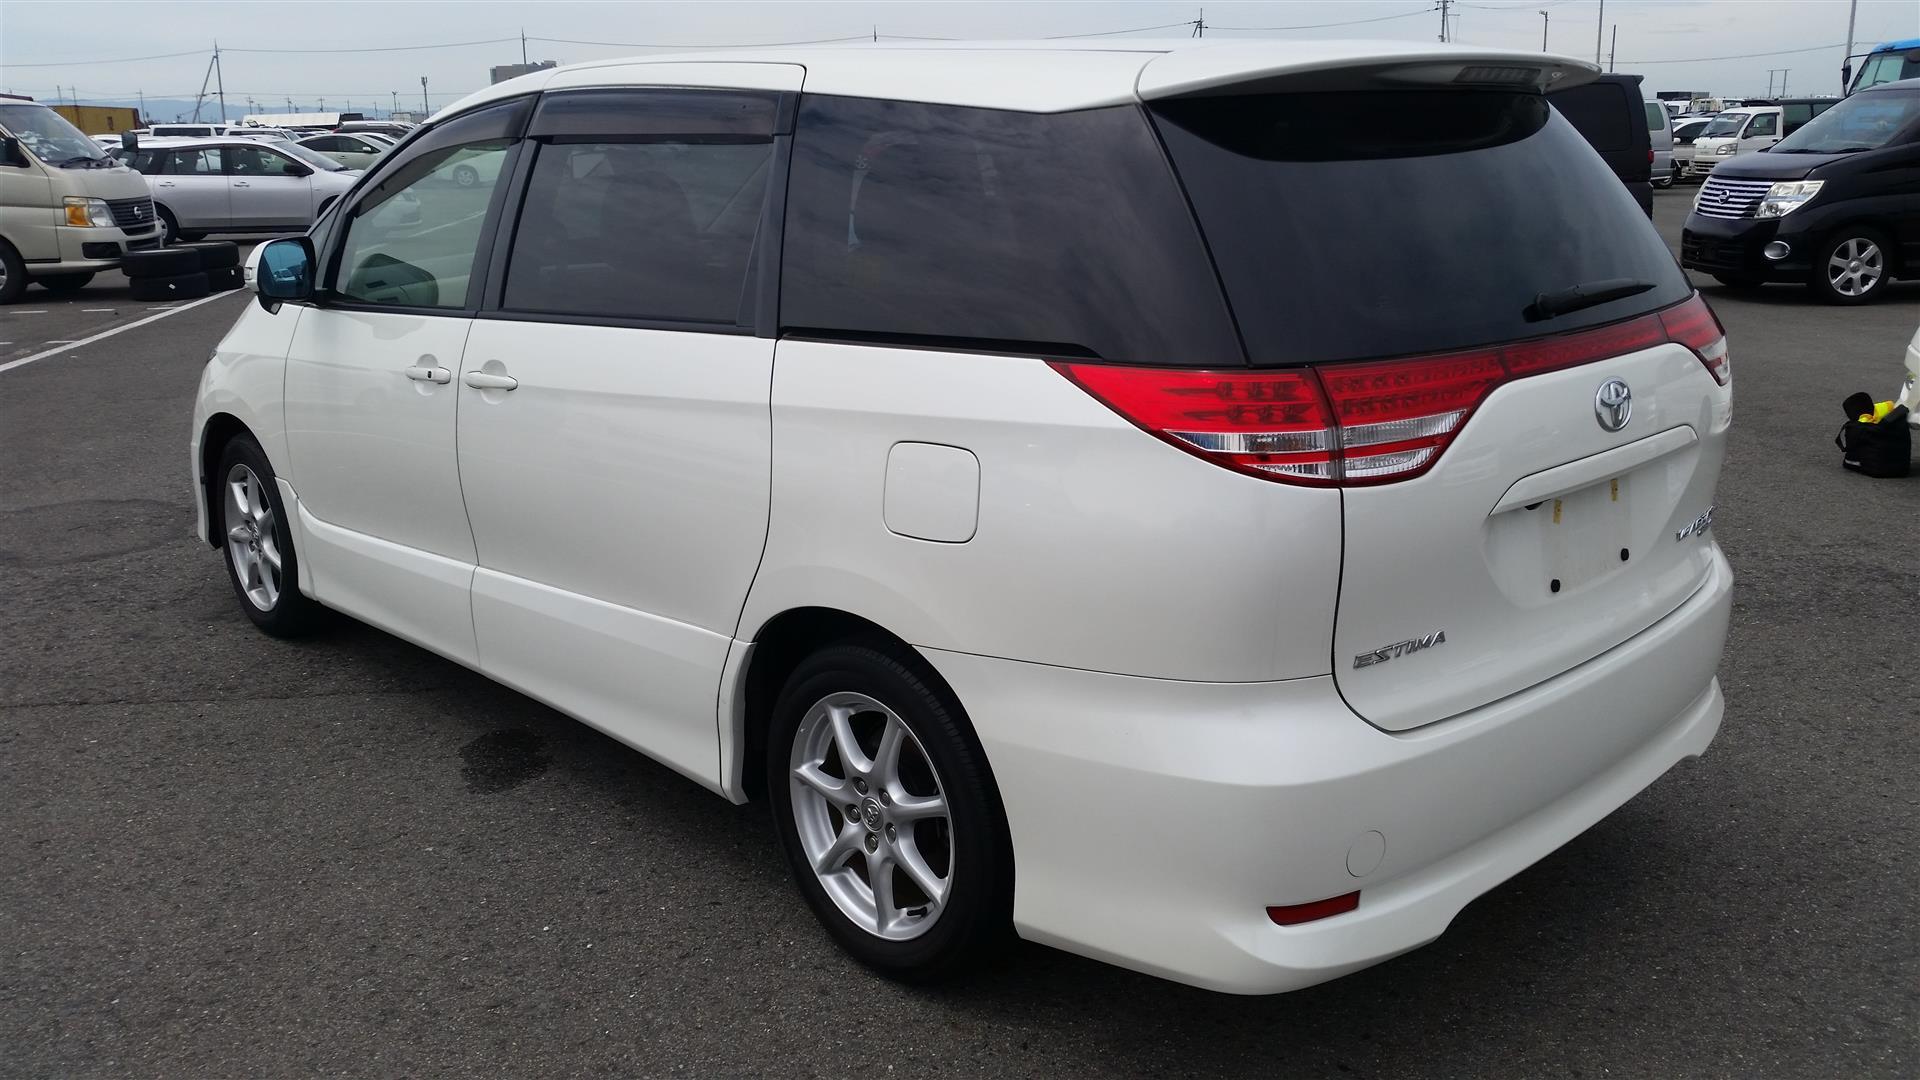 2008 Toyota Estima rear